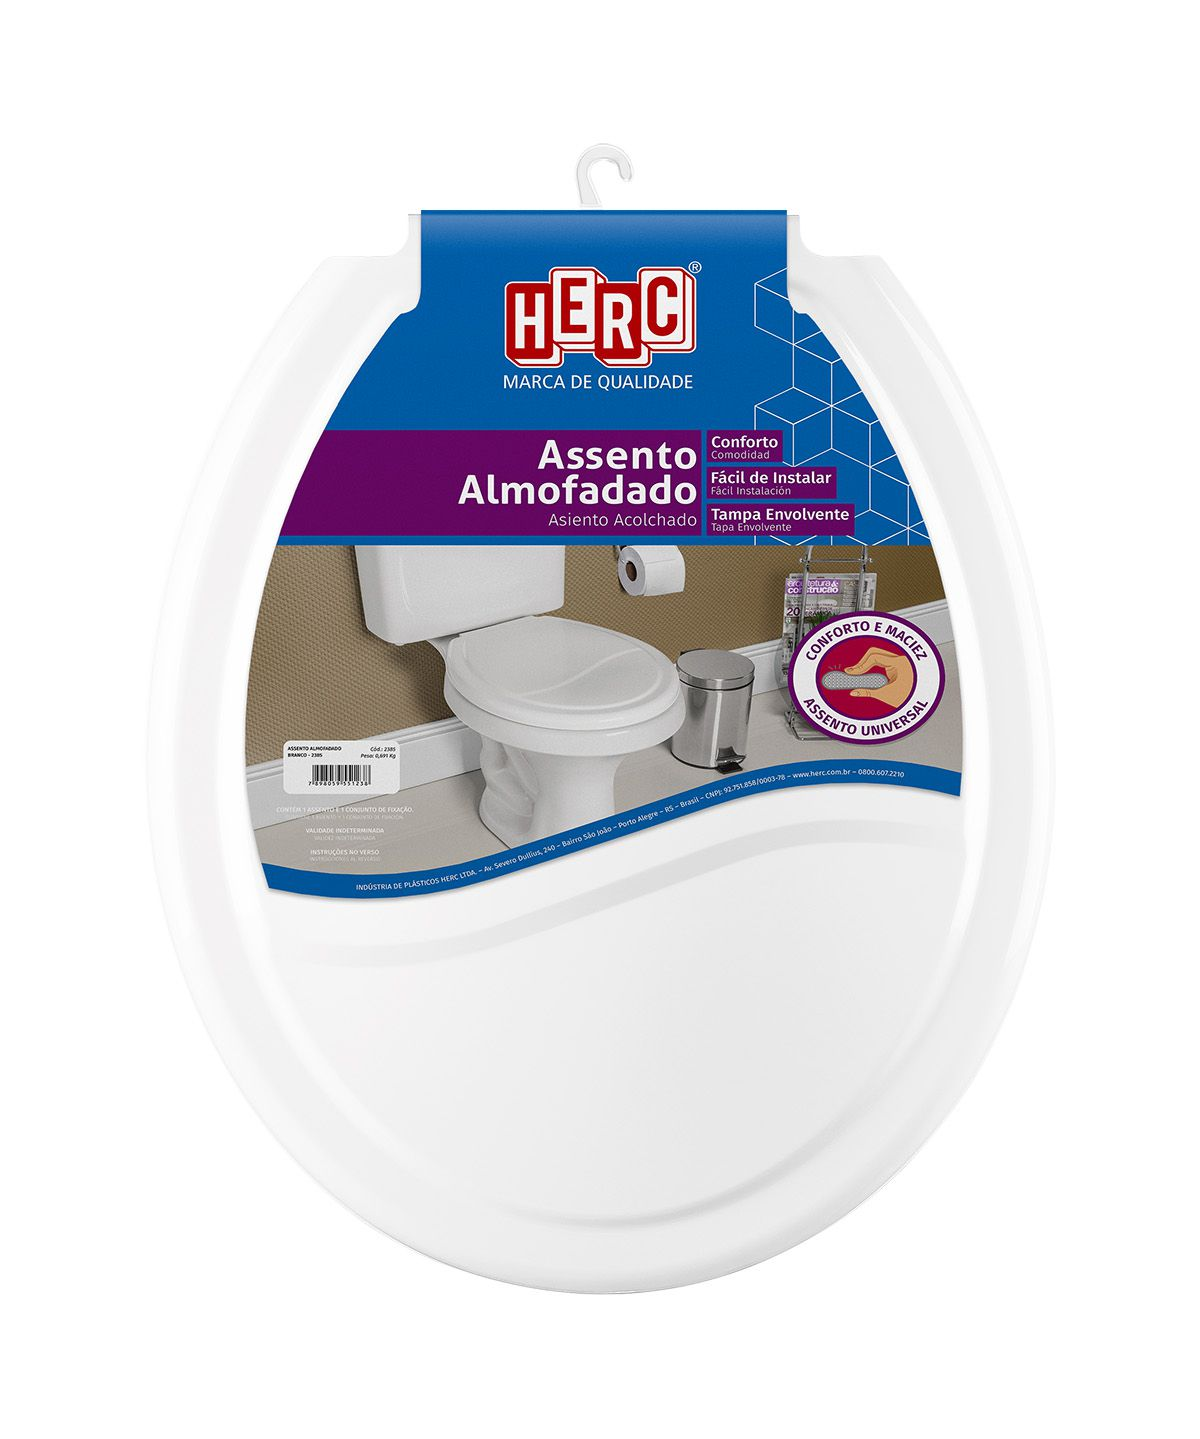 Tampa de Vaso / Assento Sanitário Branco Almofadado 2385 Herc